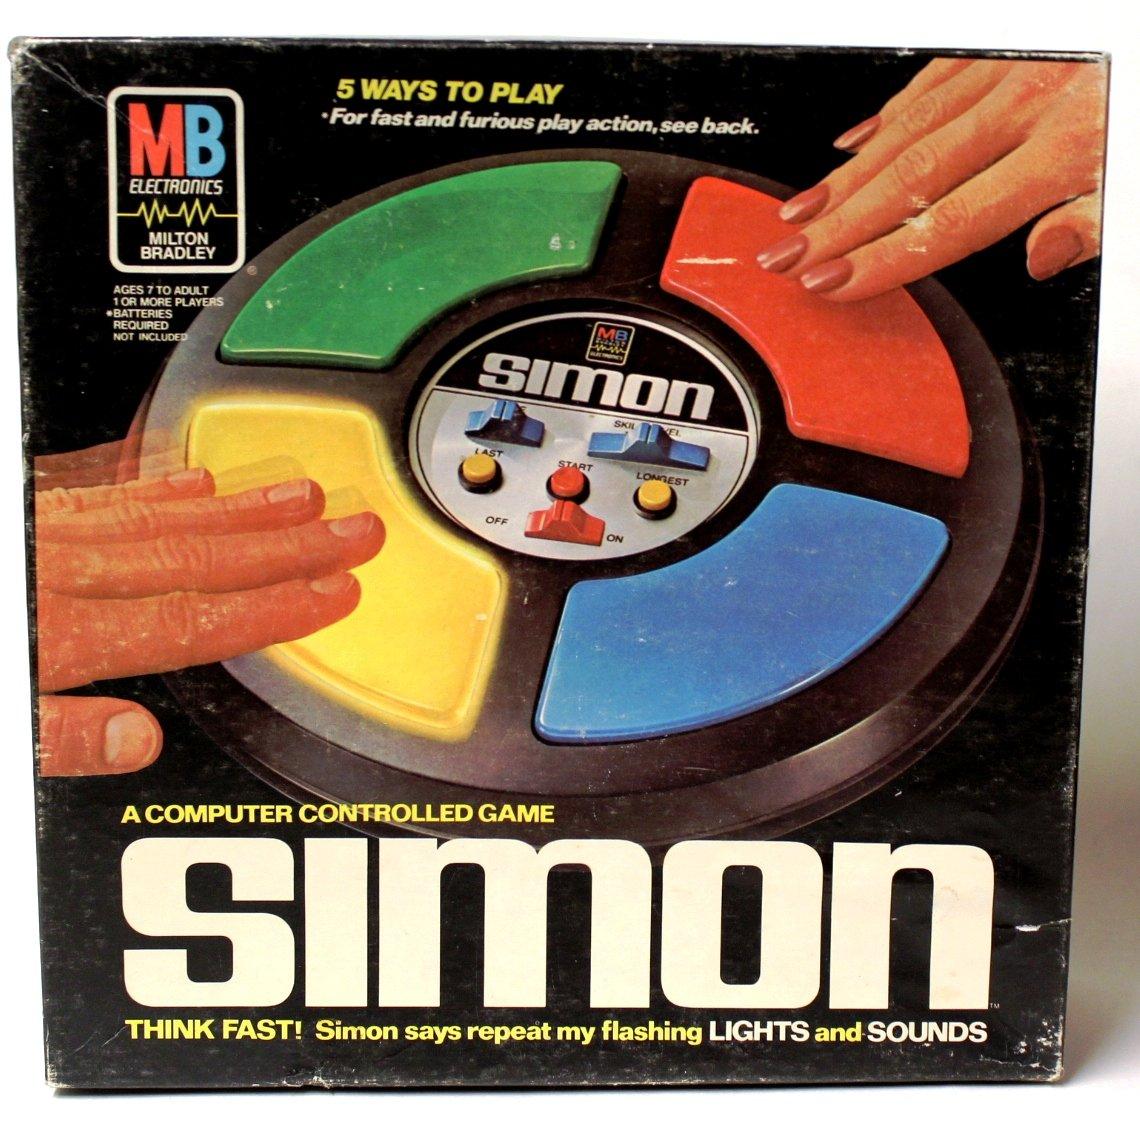 【18%OFF】 [ミルトンブラッドリー]Milton Bradley Bradley Simon 4850 4850 [並行輸入品] [並行輸入品] B002WRVBY8, 八束村:86d69726 --- arianechie.dominiotemporario.com